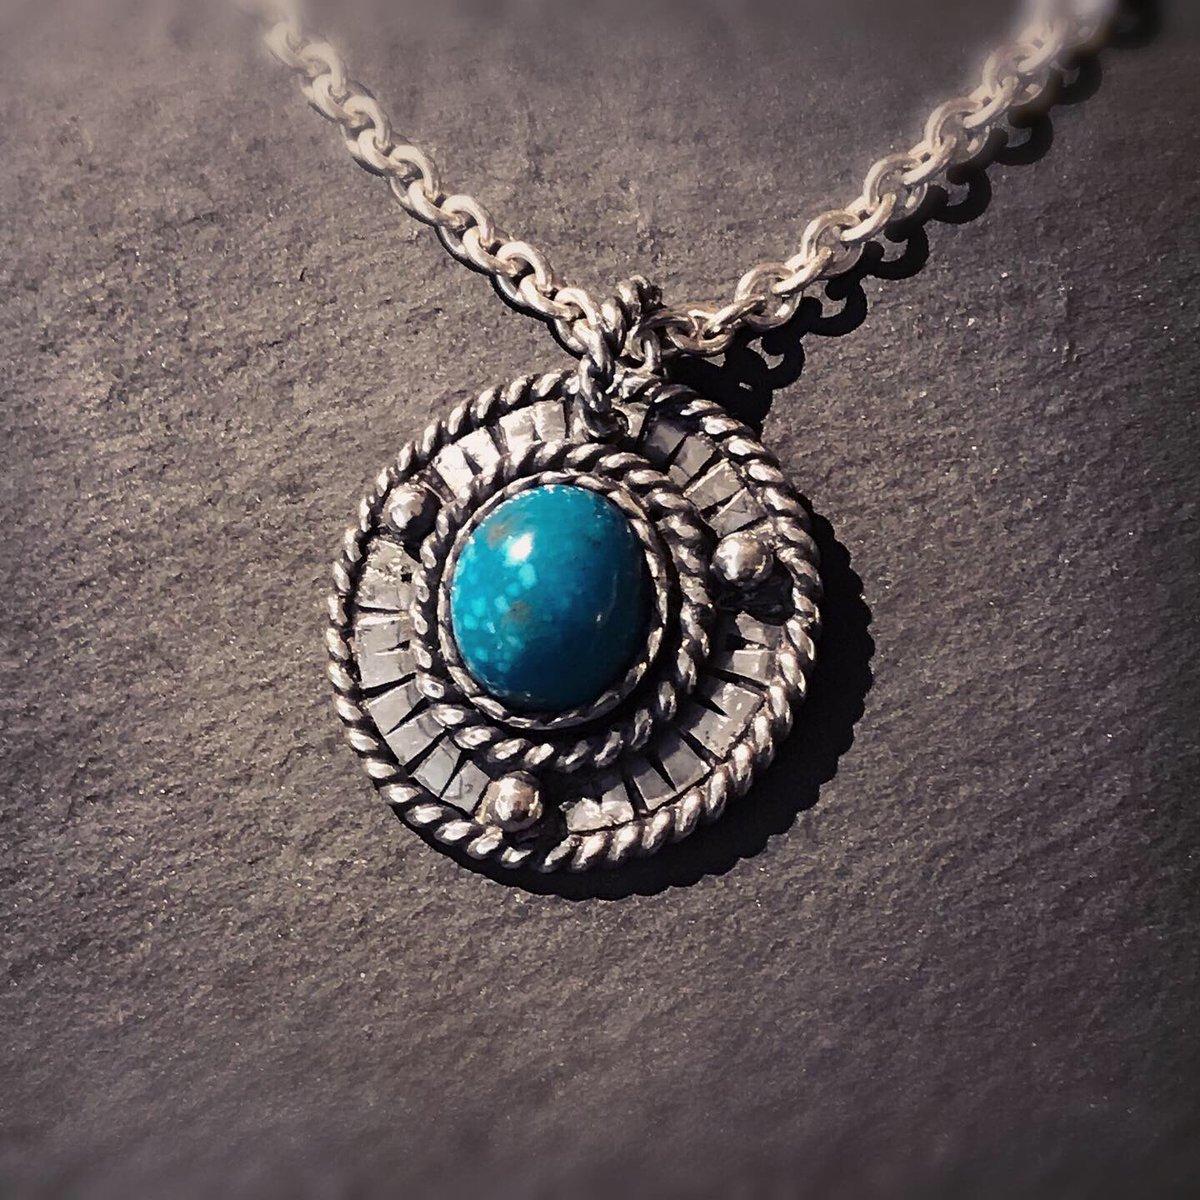 #handmade #jewelry #turquoise #925silver #blue #青 #海 #空 #宝石 #九二三pic.twitter.com/9xHk6Uz4XW